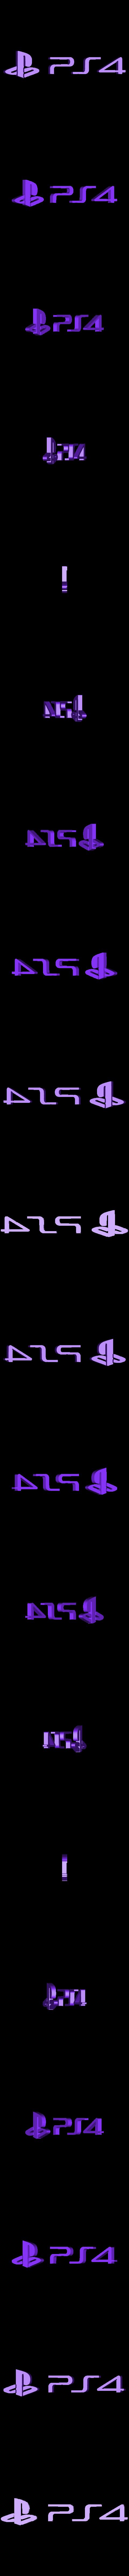 ps4_letters.stl Download free STL file Playstation 4/3 Game Case Holder- Flat & Full Back Options • 3D printing template, mark579